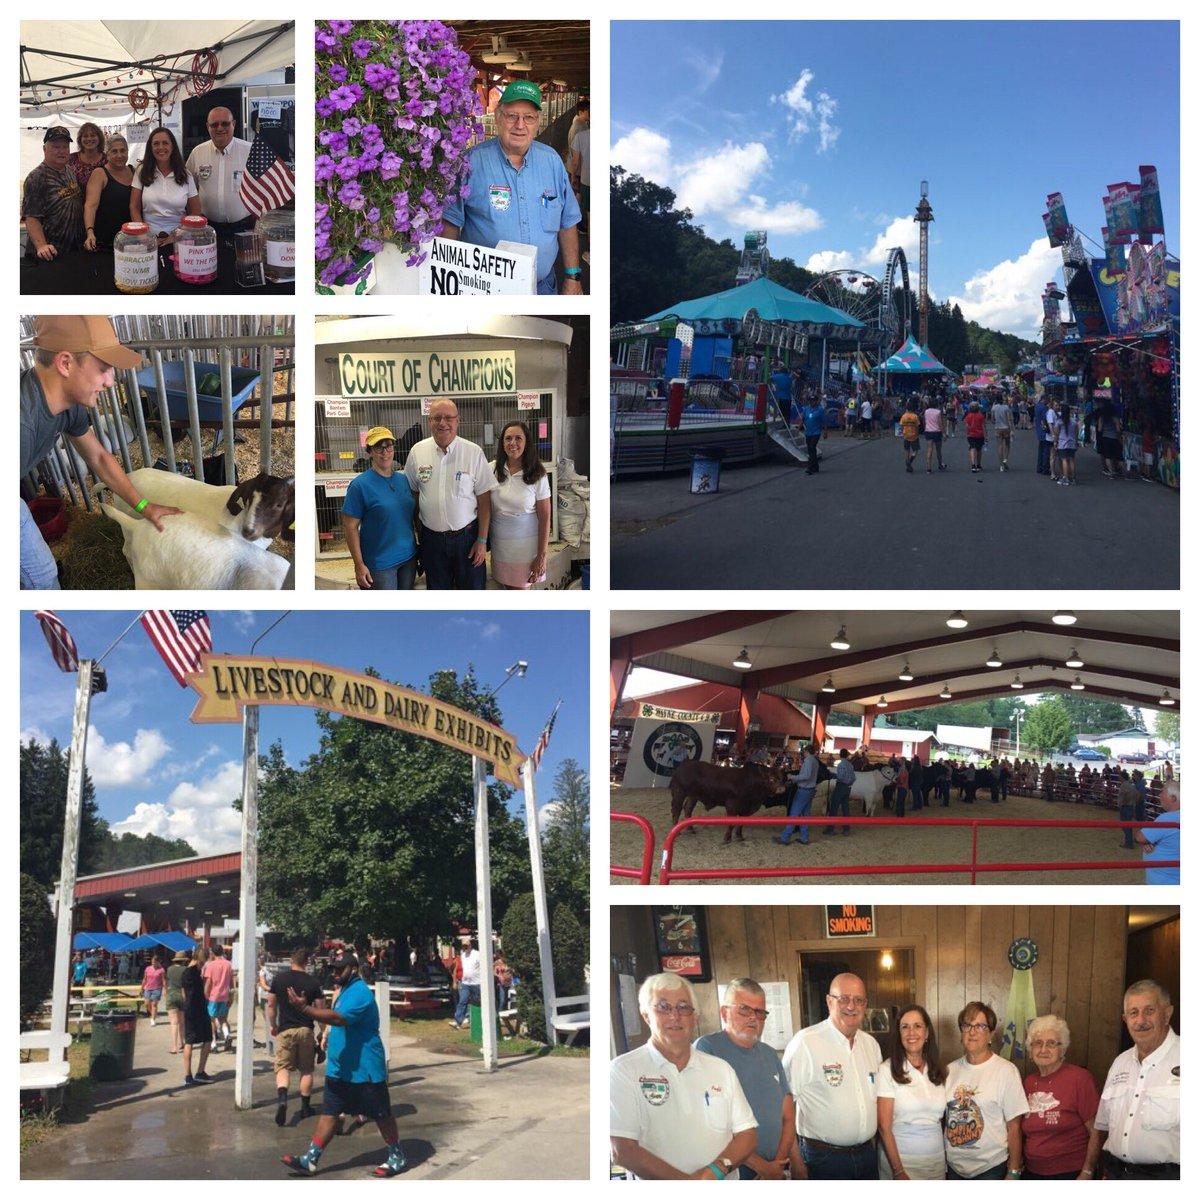 The 157th @WayneCoFairPA runs through Saturday - a family tradition where farm meets food and fun!